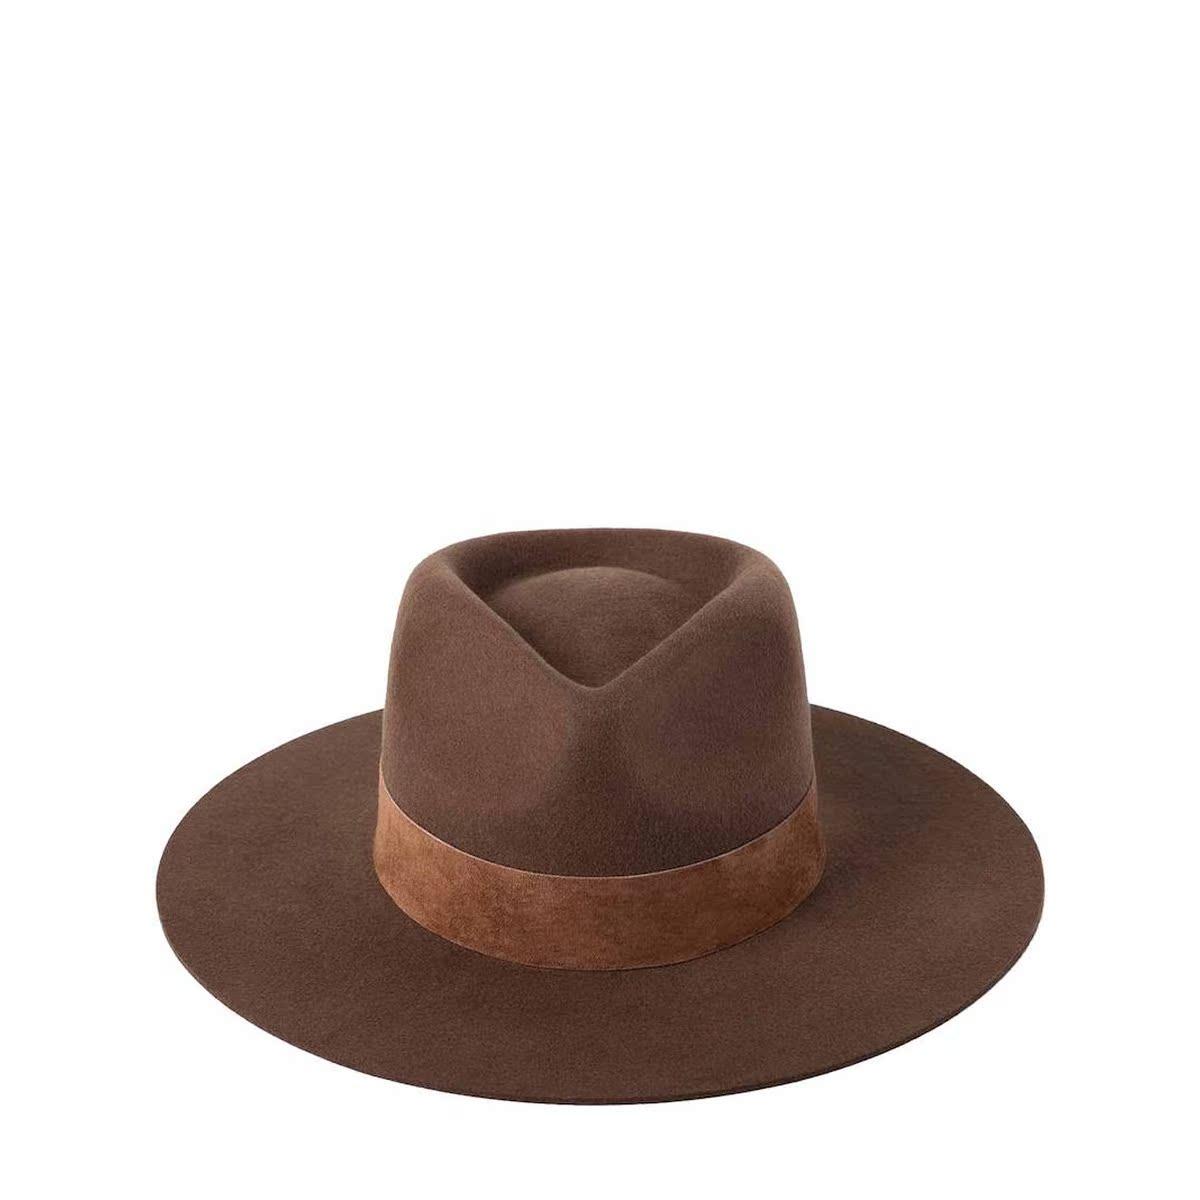 代购Lack Of Color MIRAGE COCO羊毛软呢帽女2021新款奢侈品